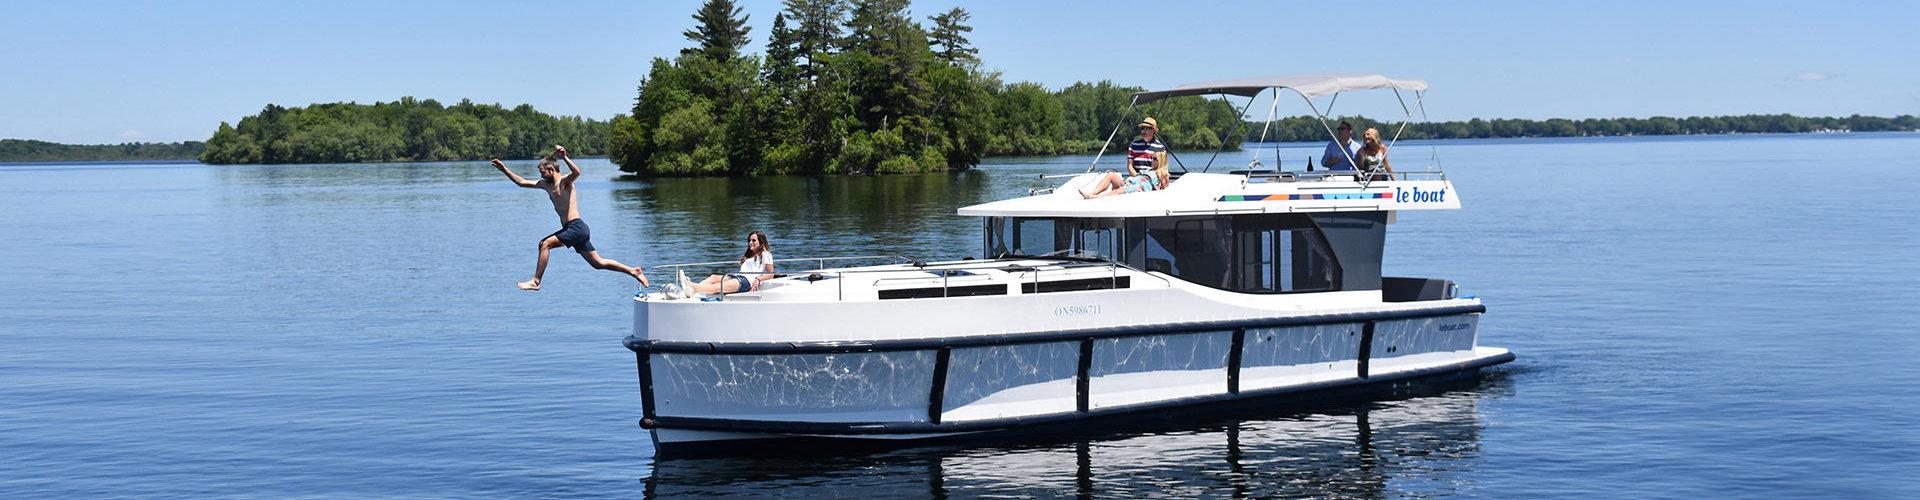 Boating in Canada